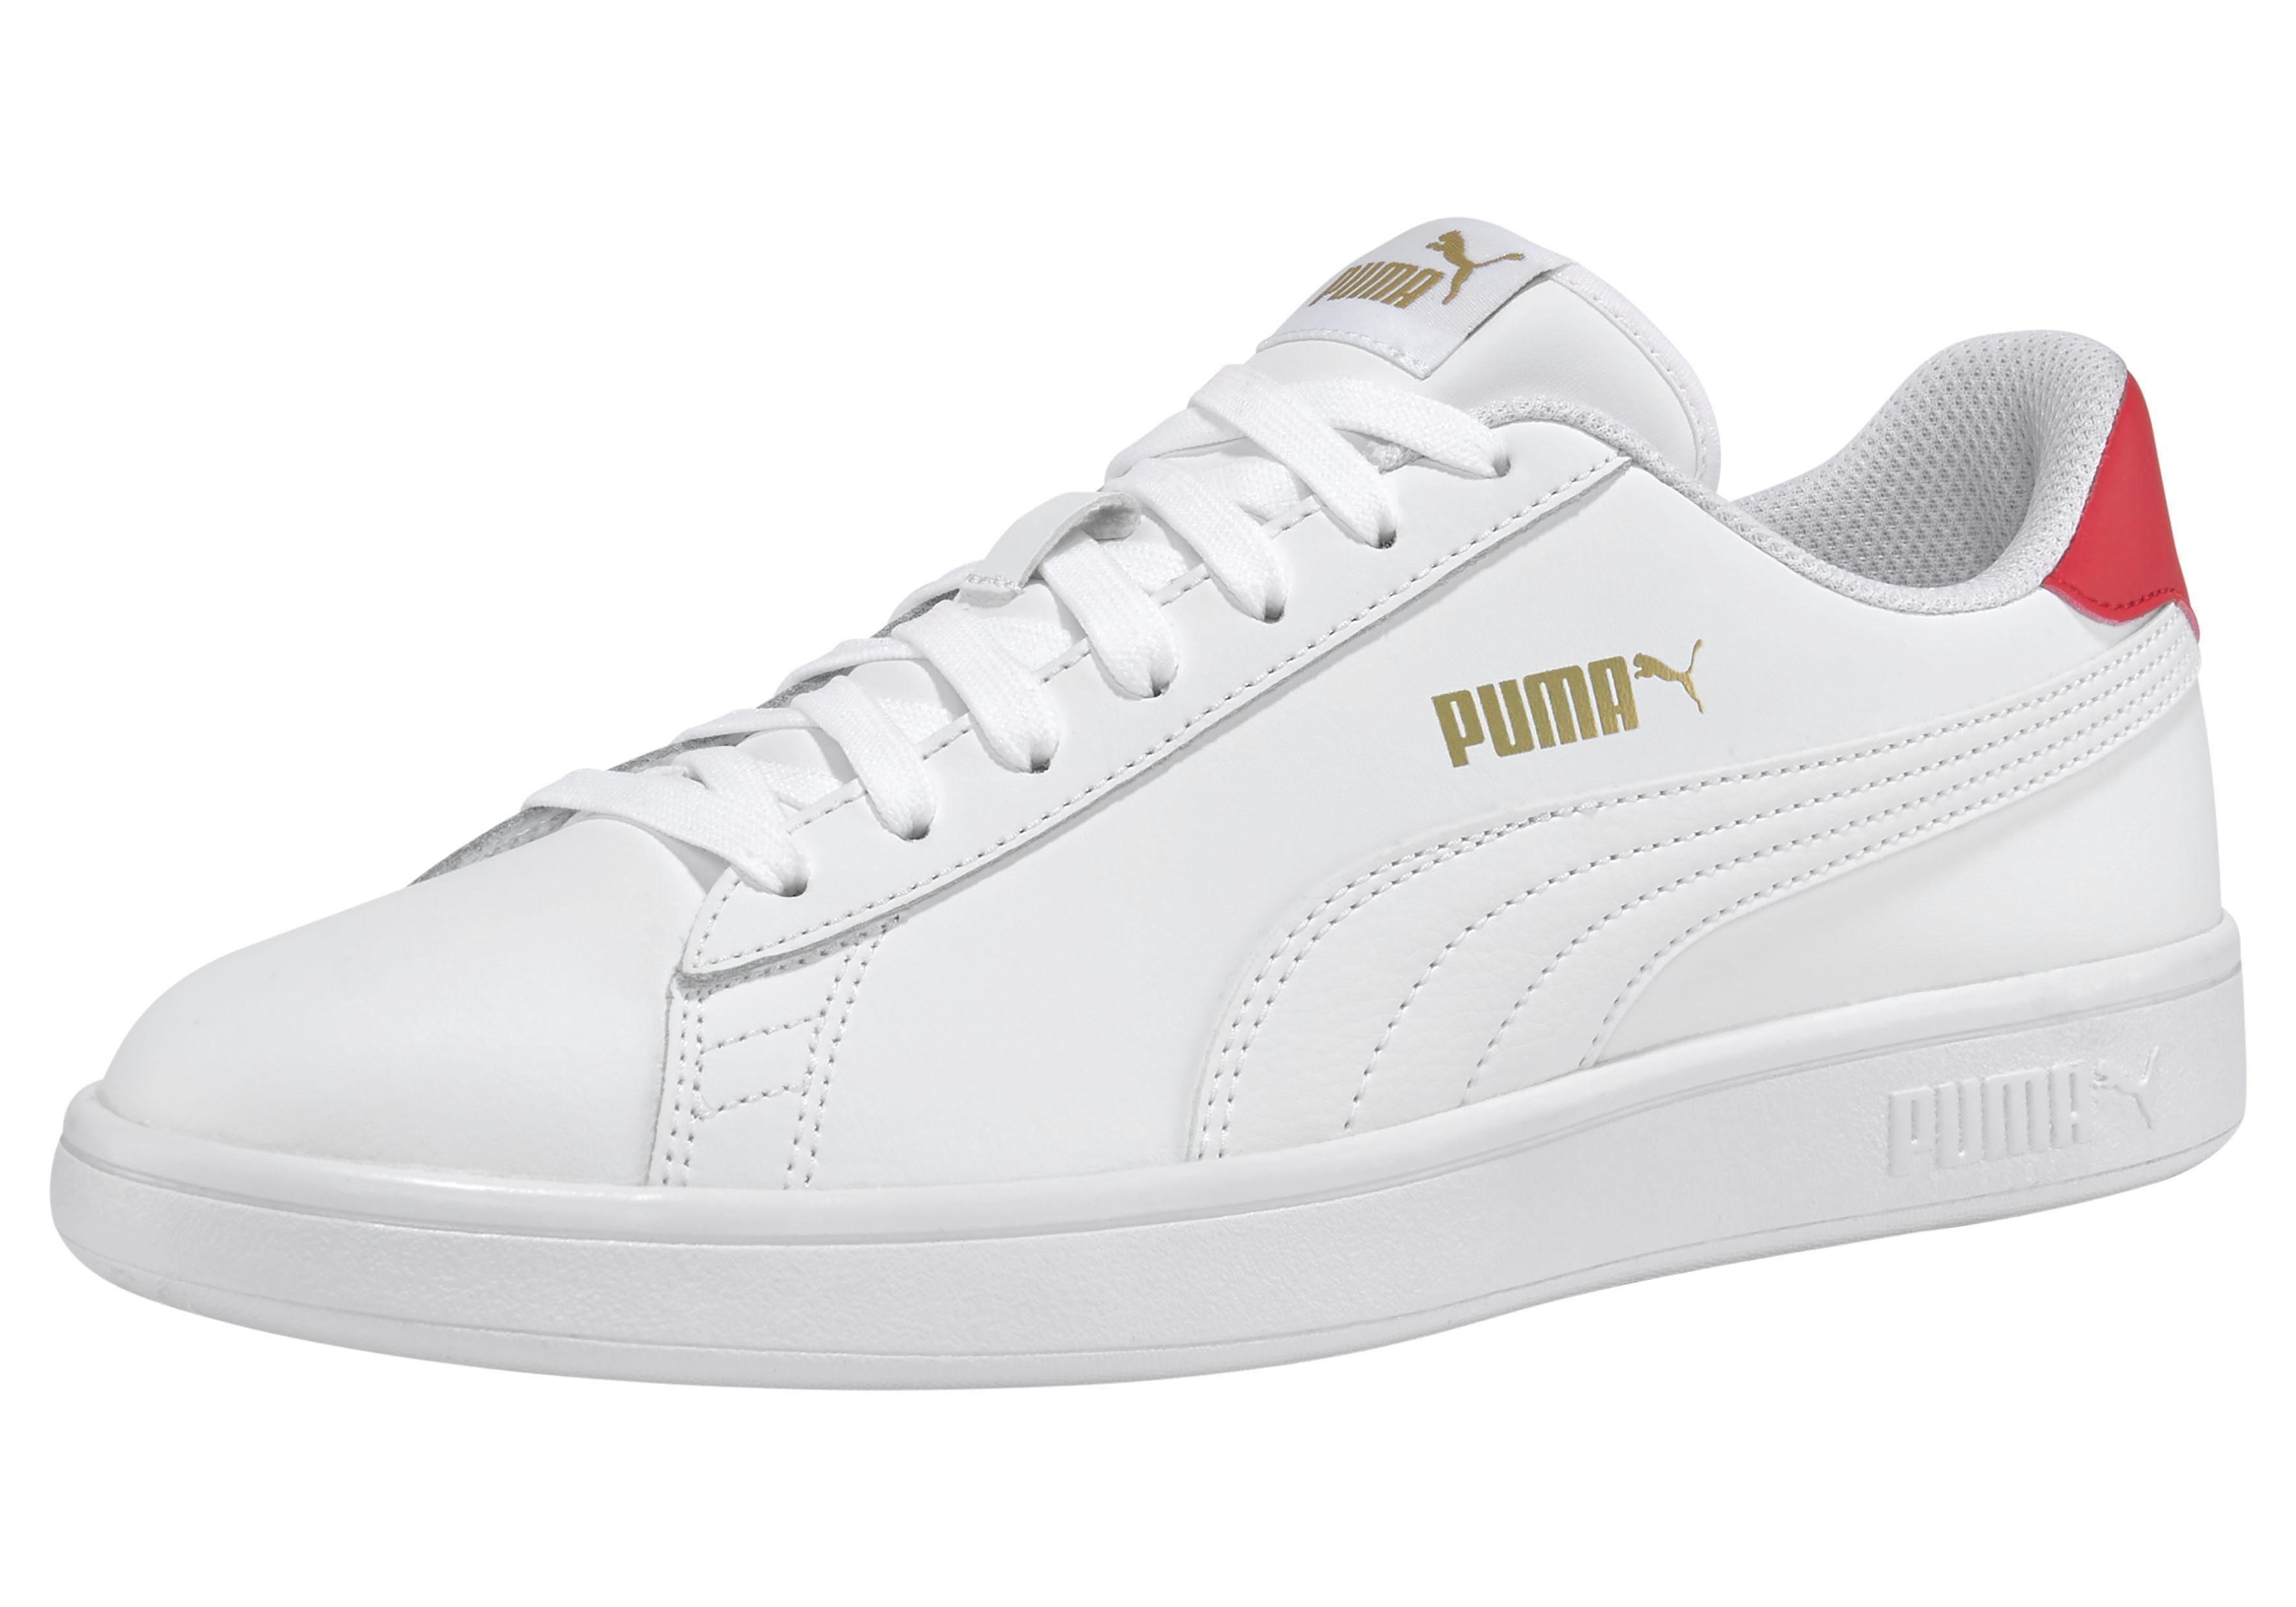 PUMA »Puma Smash v2 L« Sneaker, Klassischer Sneaker von PUMA